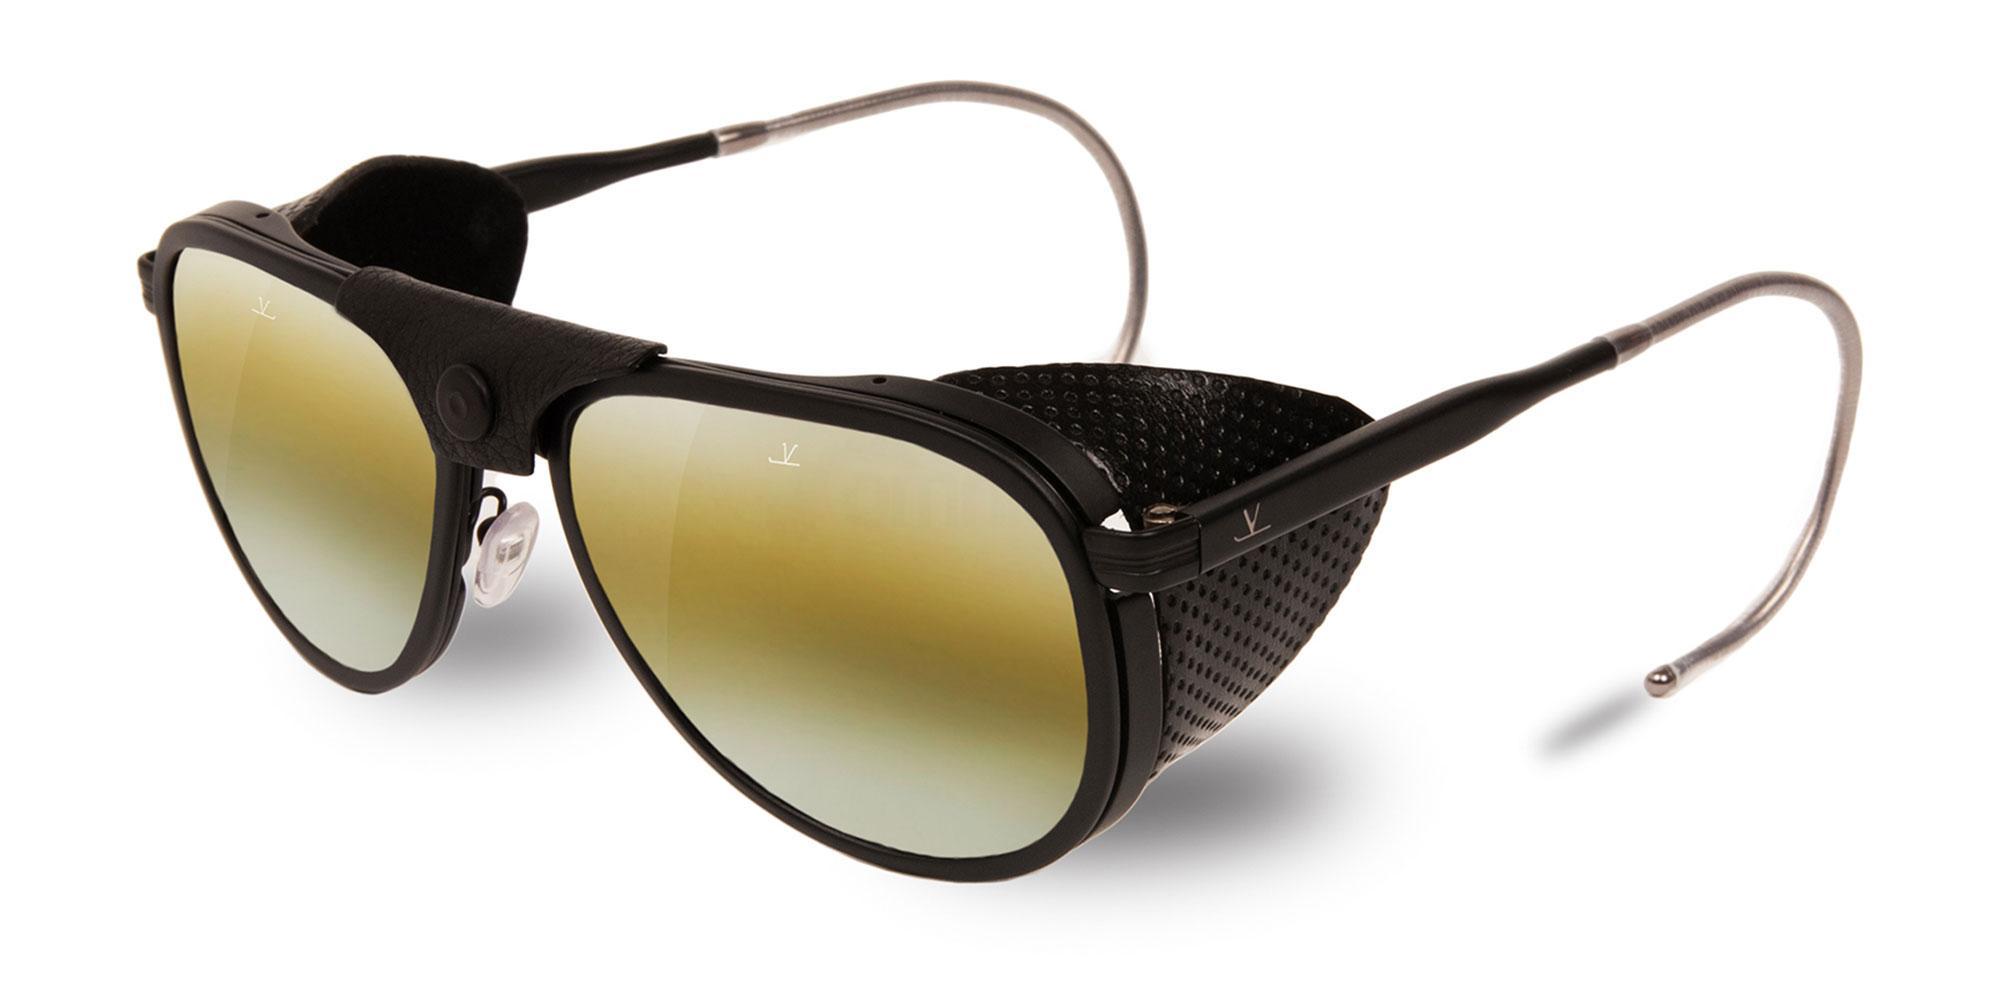 VL131500107184 VL1315 GLACIER Sunglasses, Vuarnet